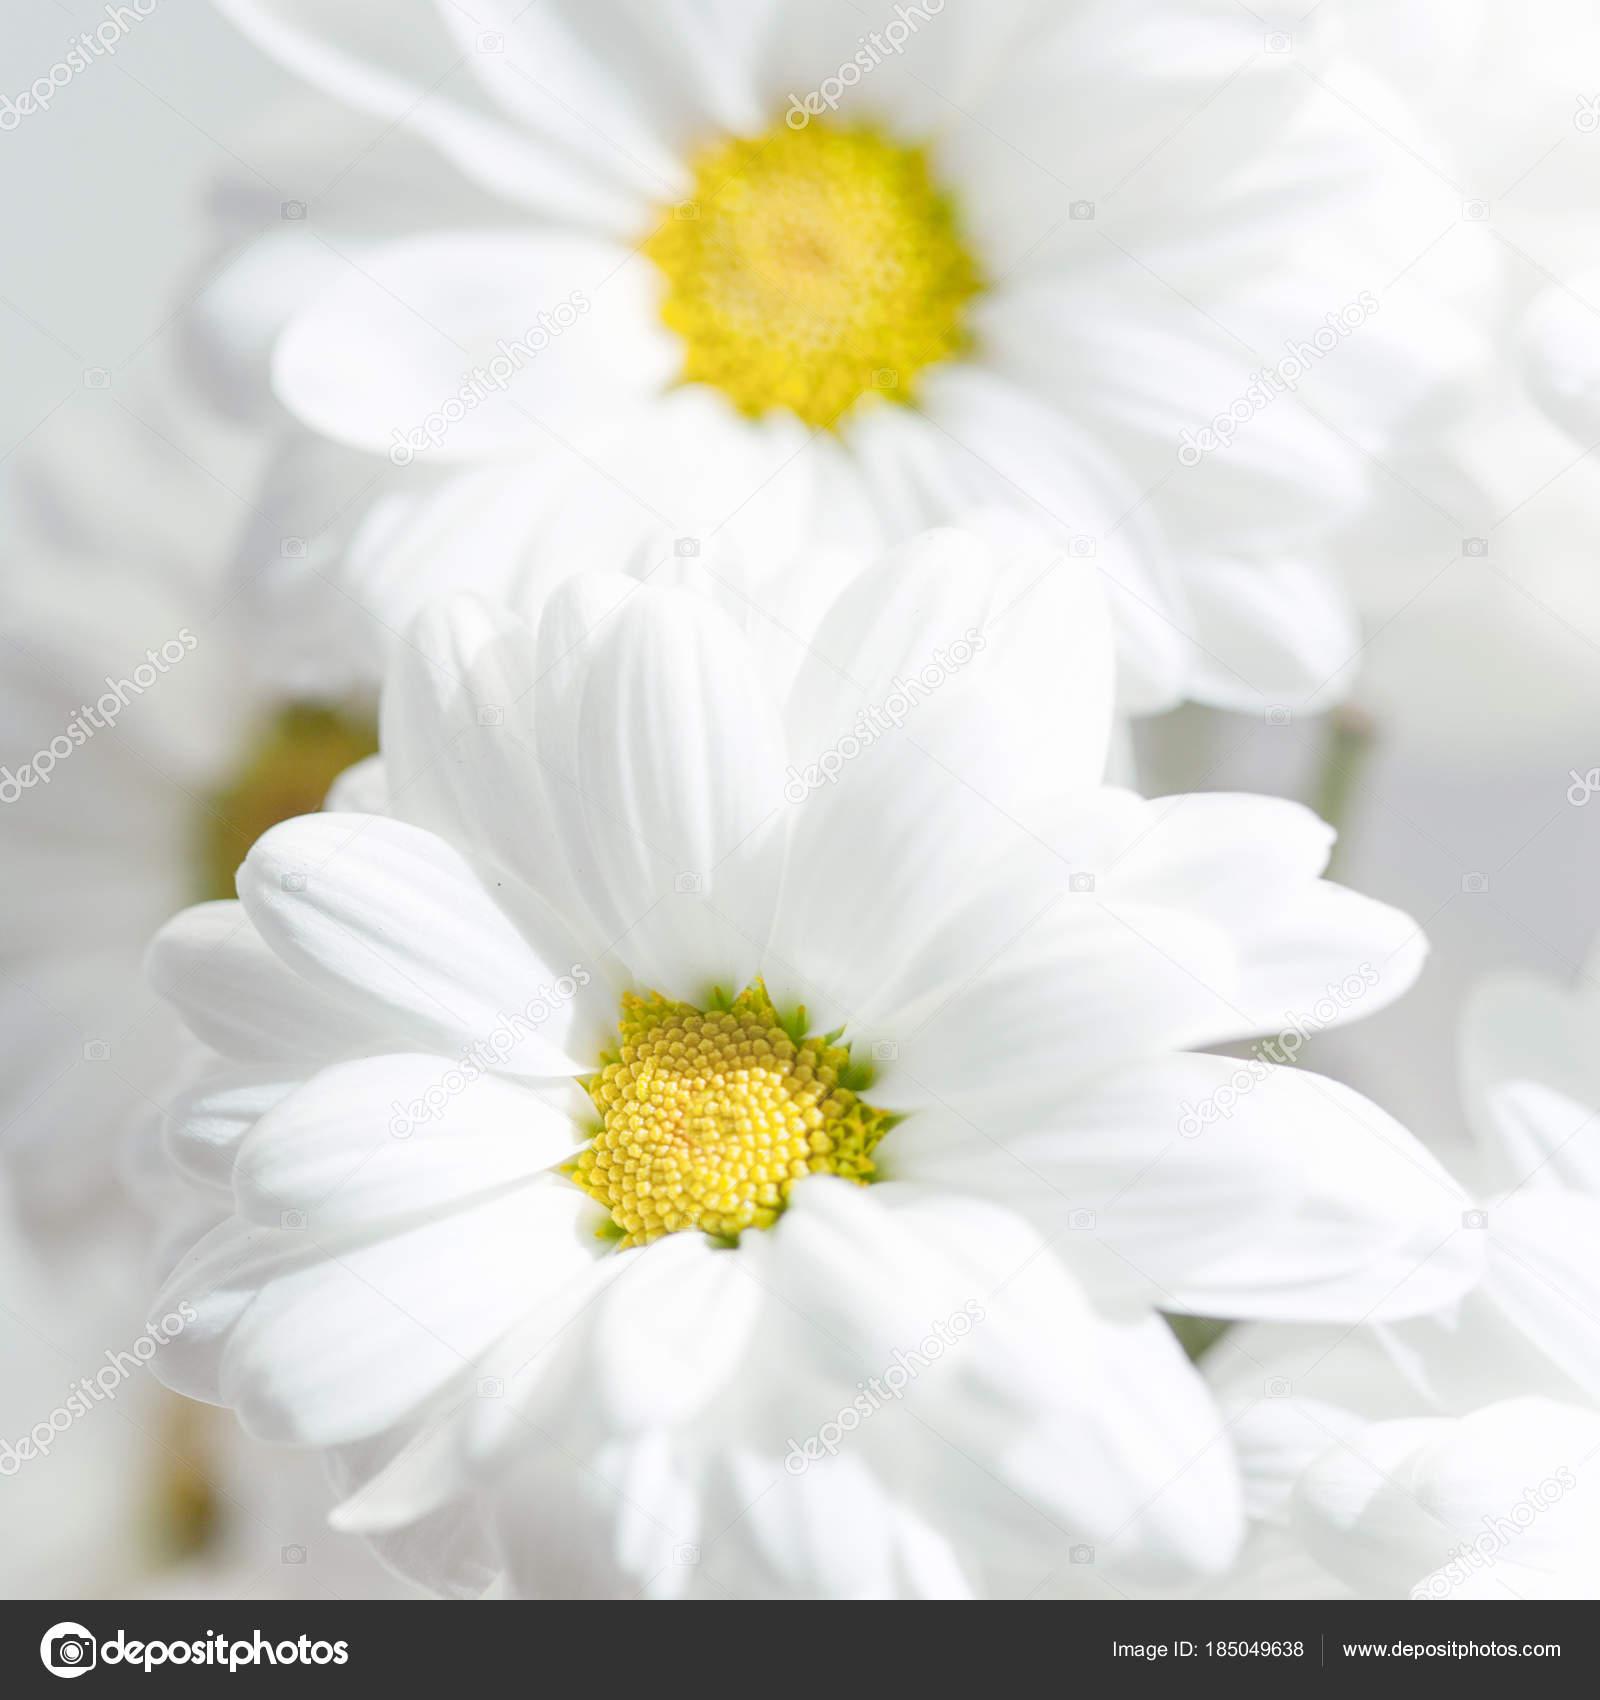 Spring flowers wallpaper white gerbera flower daisy flower grey spring flowers wallpaper white gerbera flower daisy flower grey background stock photo mightylinksfo